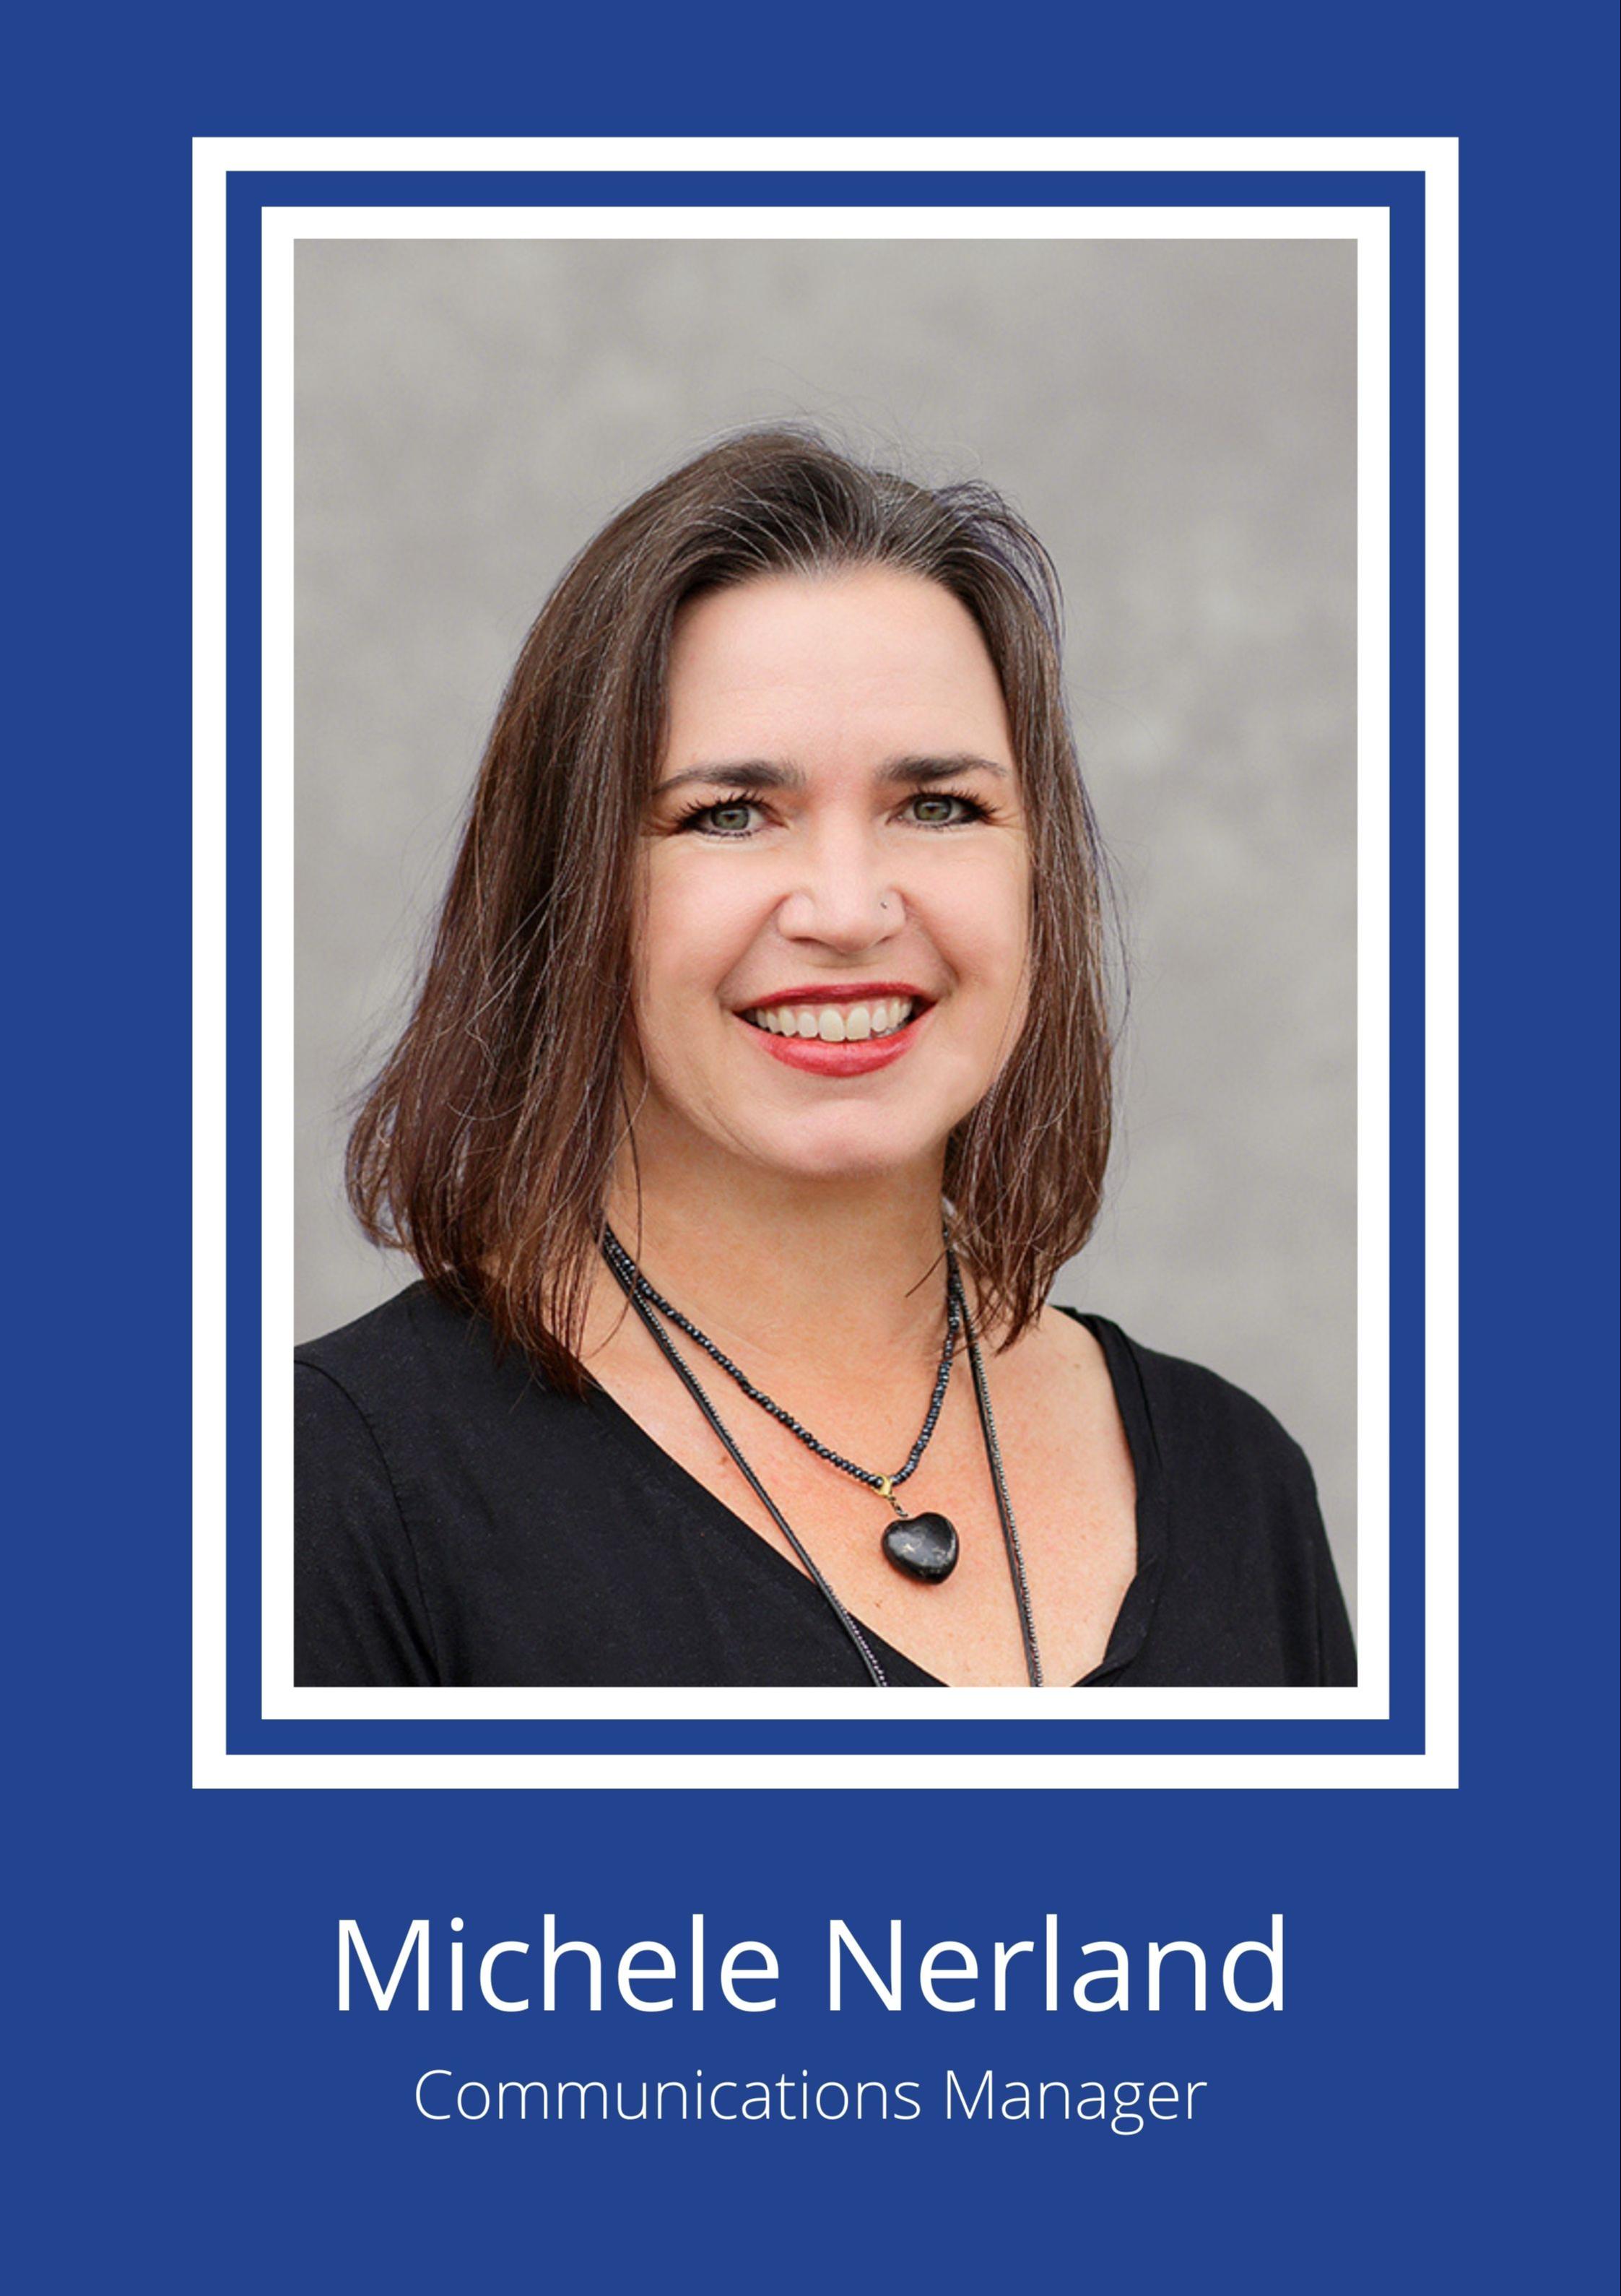 Photo of Michele Nerland.